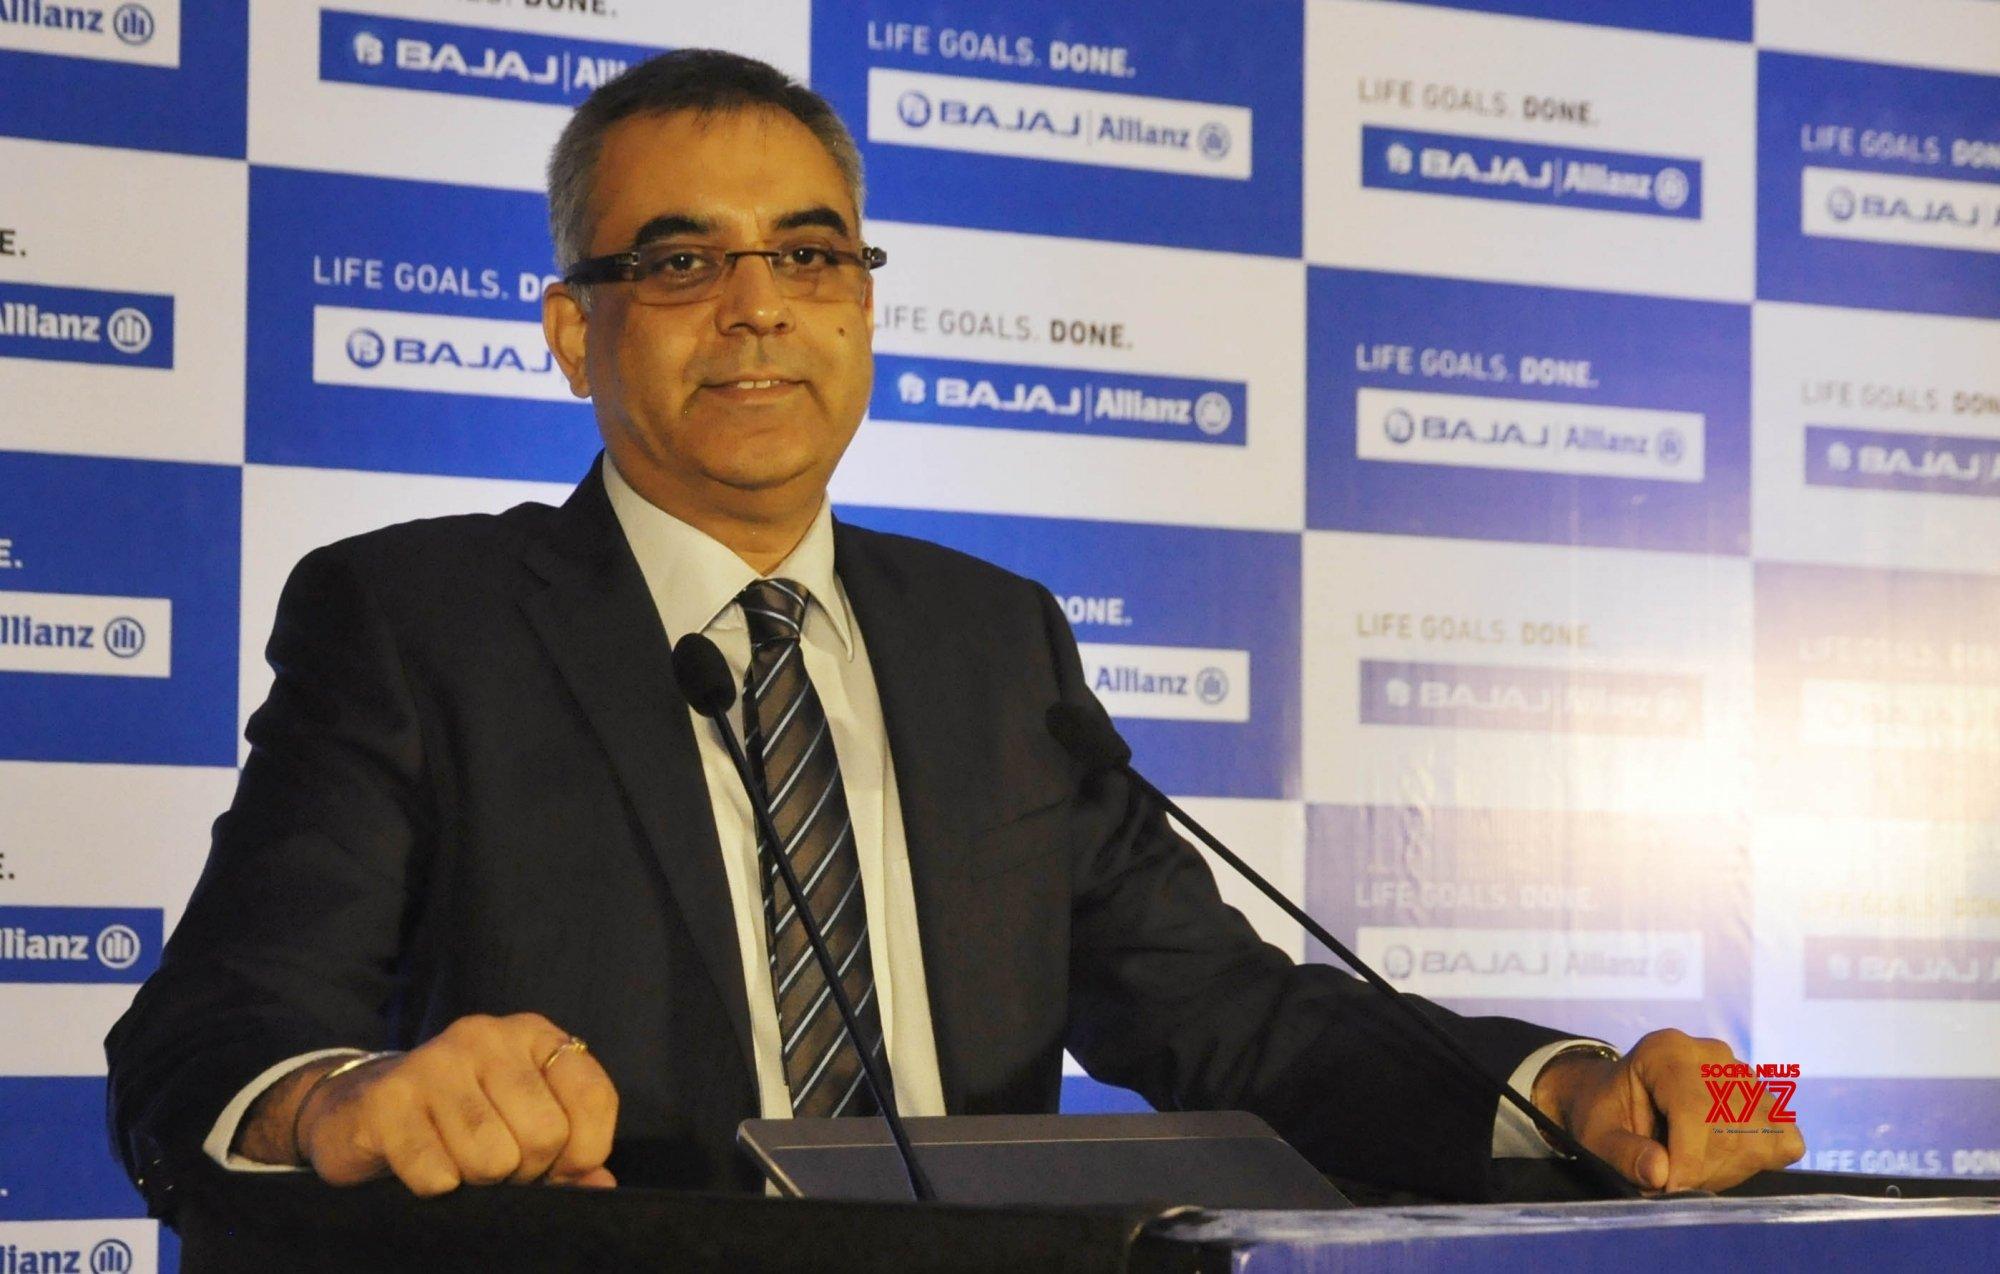 Kolkata: Bajaj Allianz Life Insurance press conference #Gallery